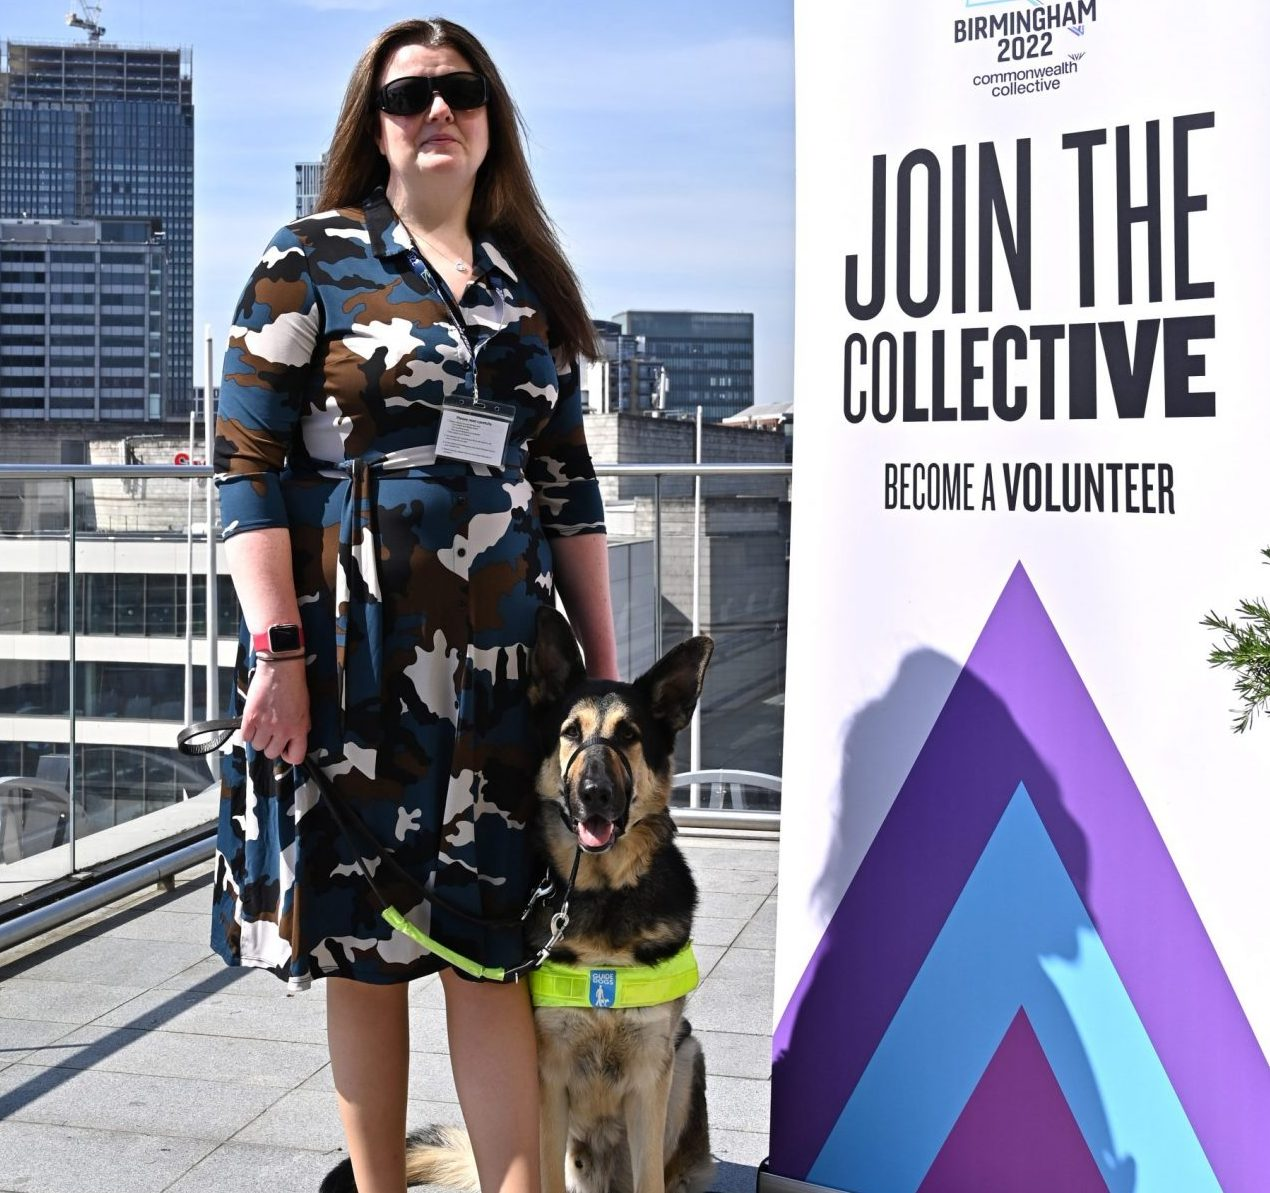 Birmingham 2022 announces deadline for volunteer applications